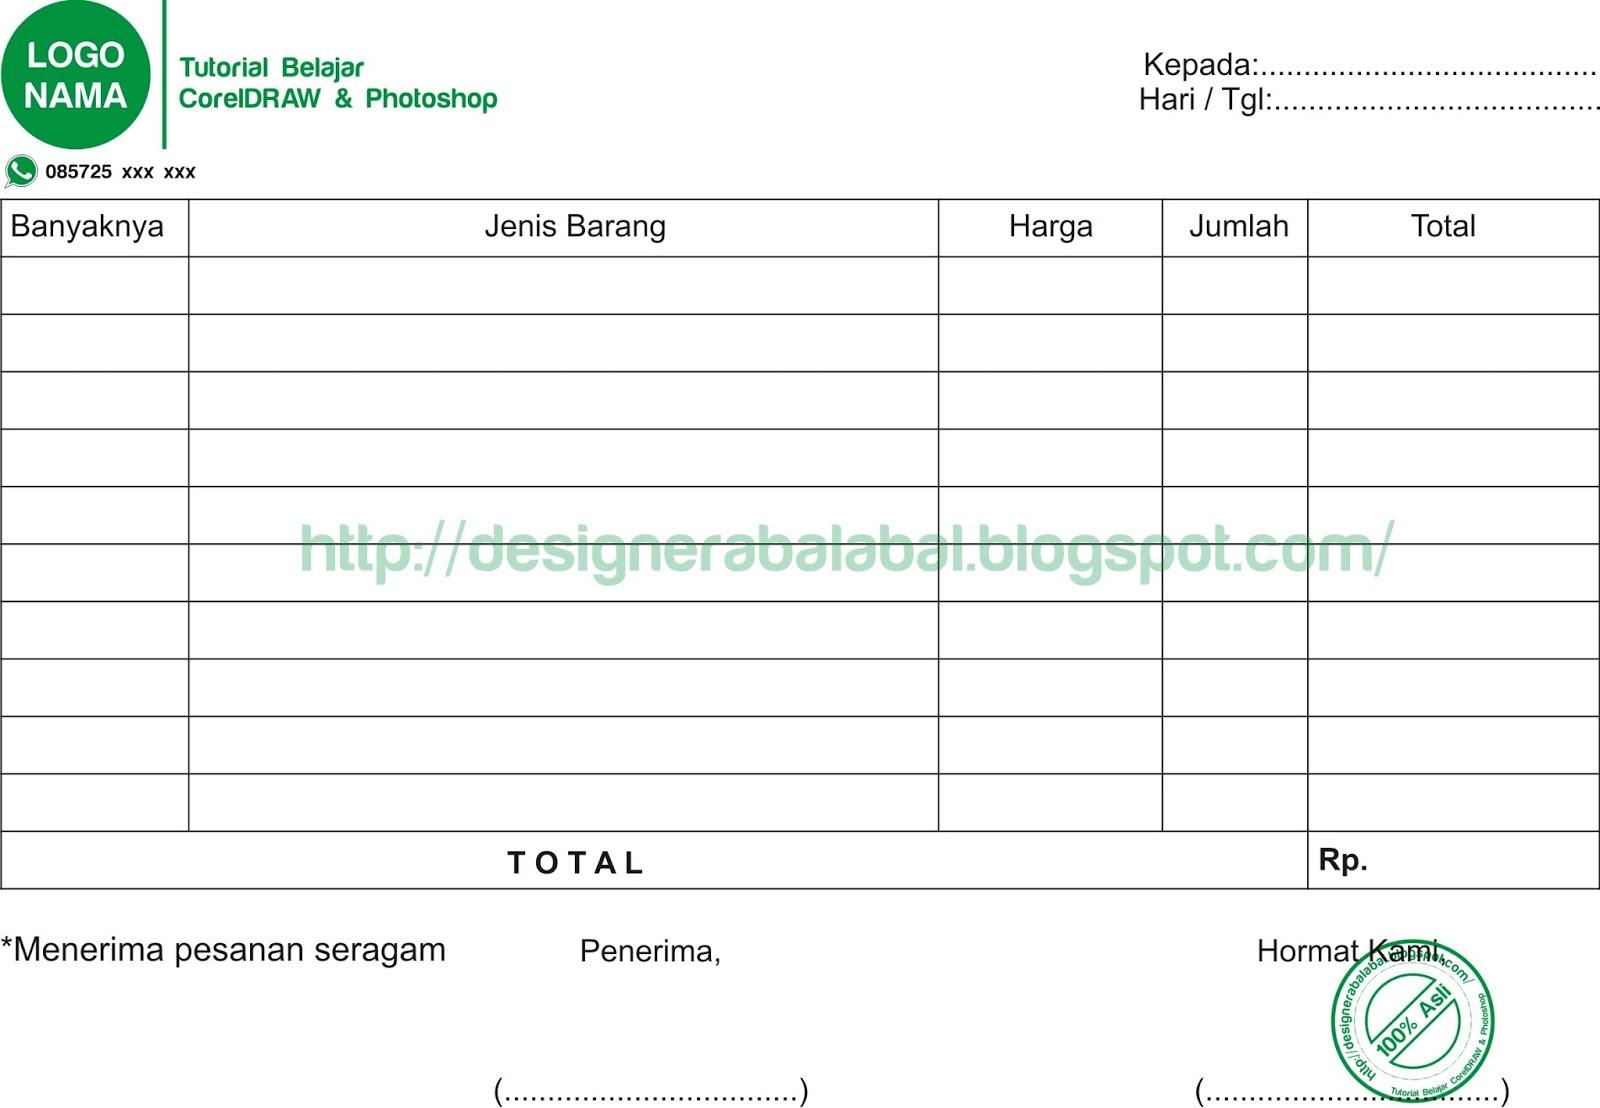 Download Desain Nota Format CorelDRAW | Belajar CorelDRAW ...